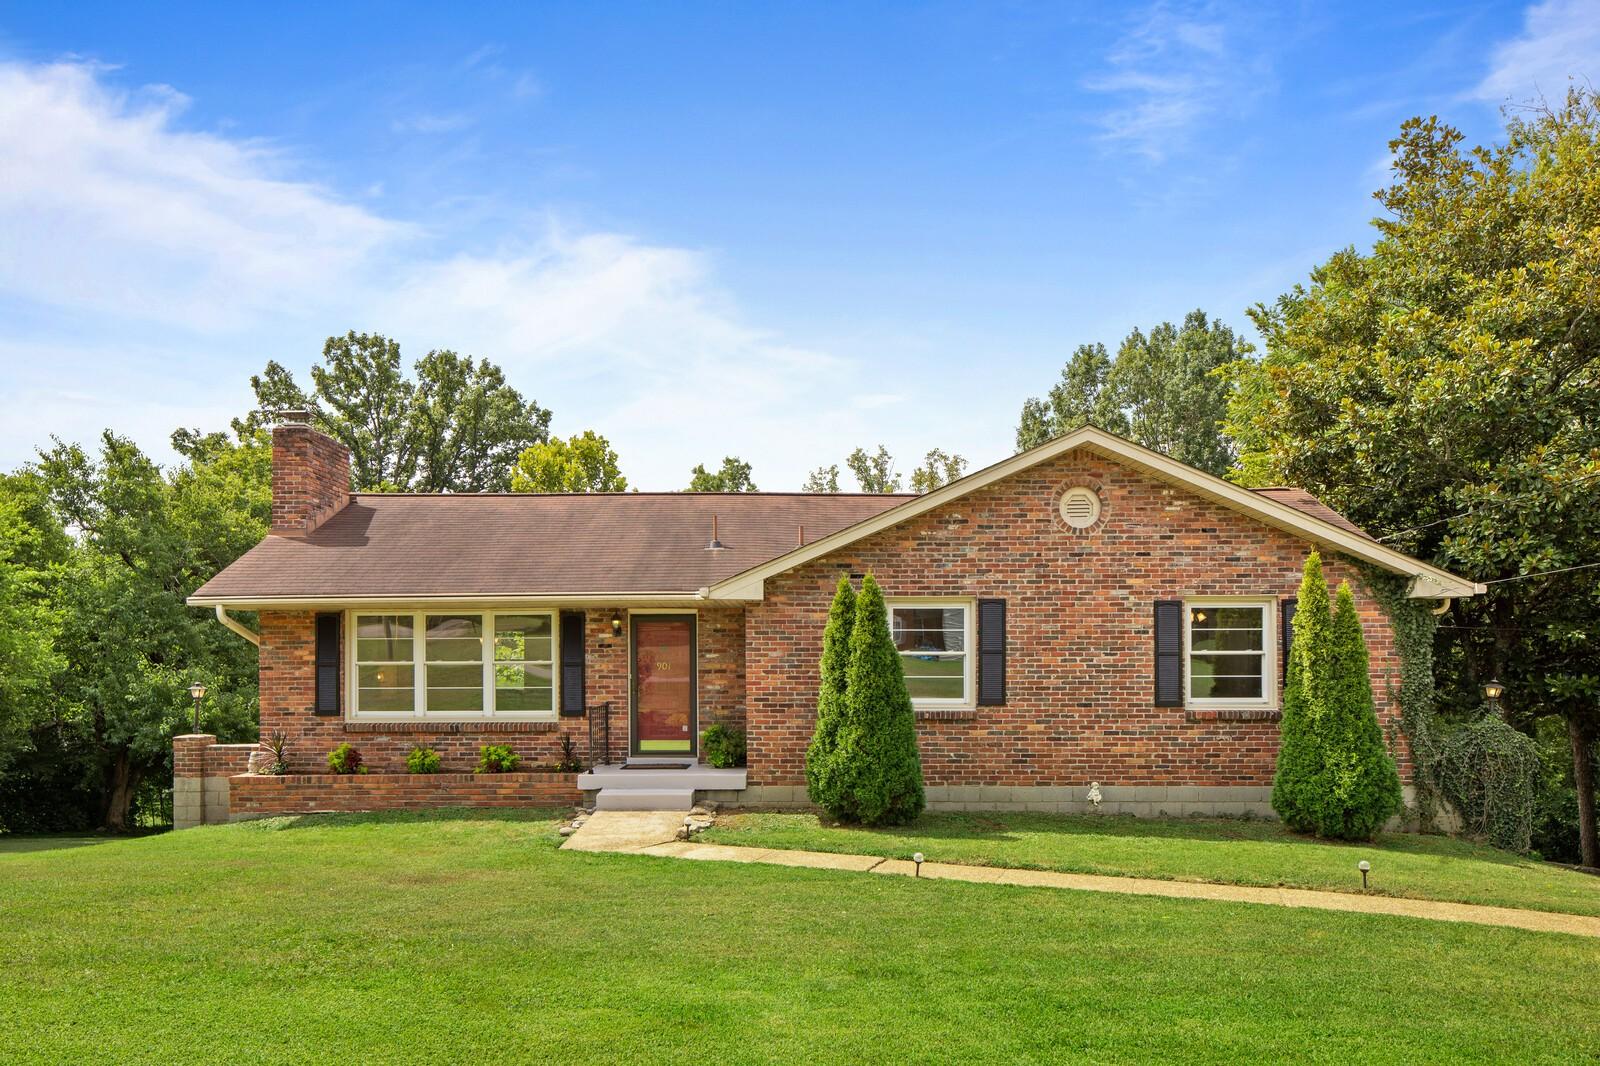 901 Fairoaks Dr Property Photo - Madison, TN real estate listing